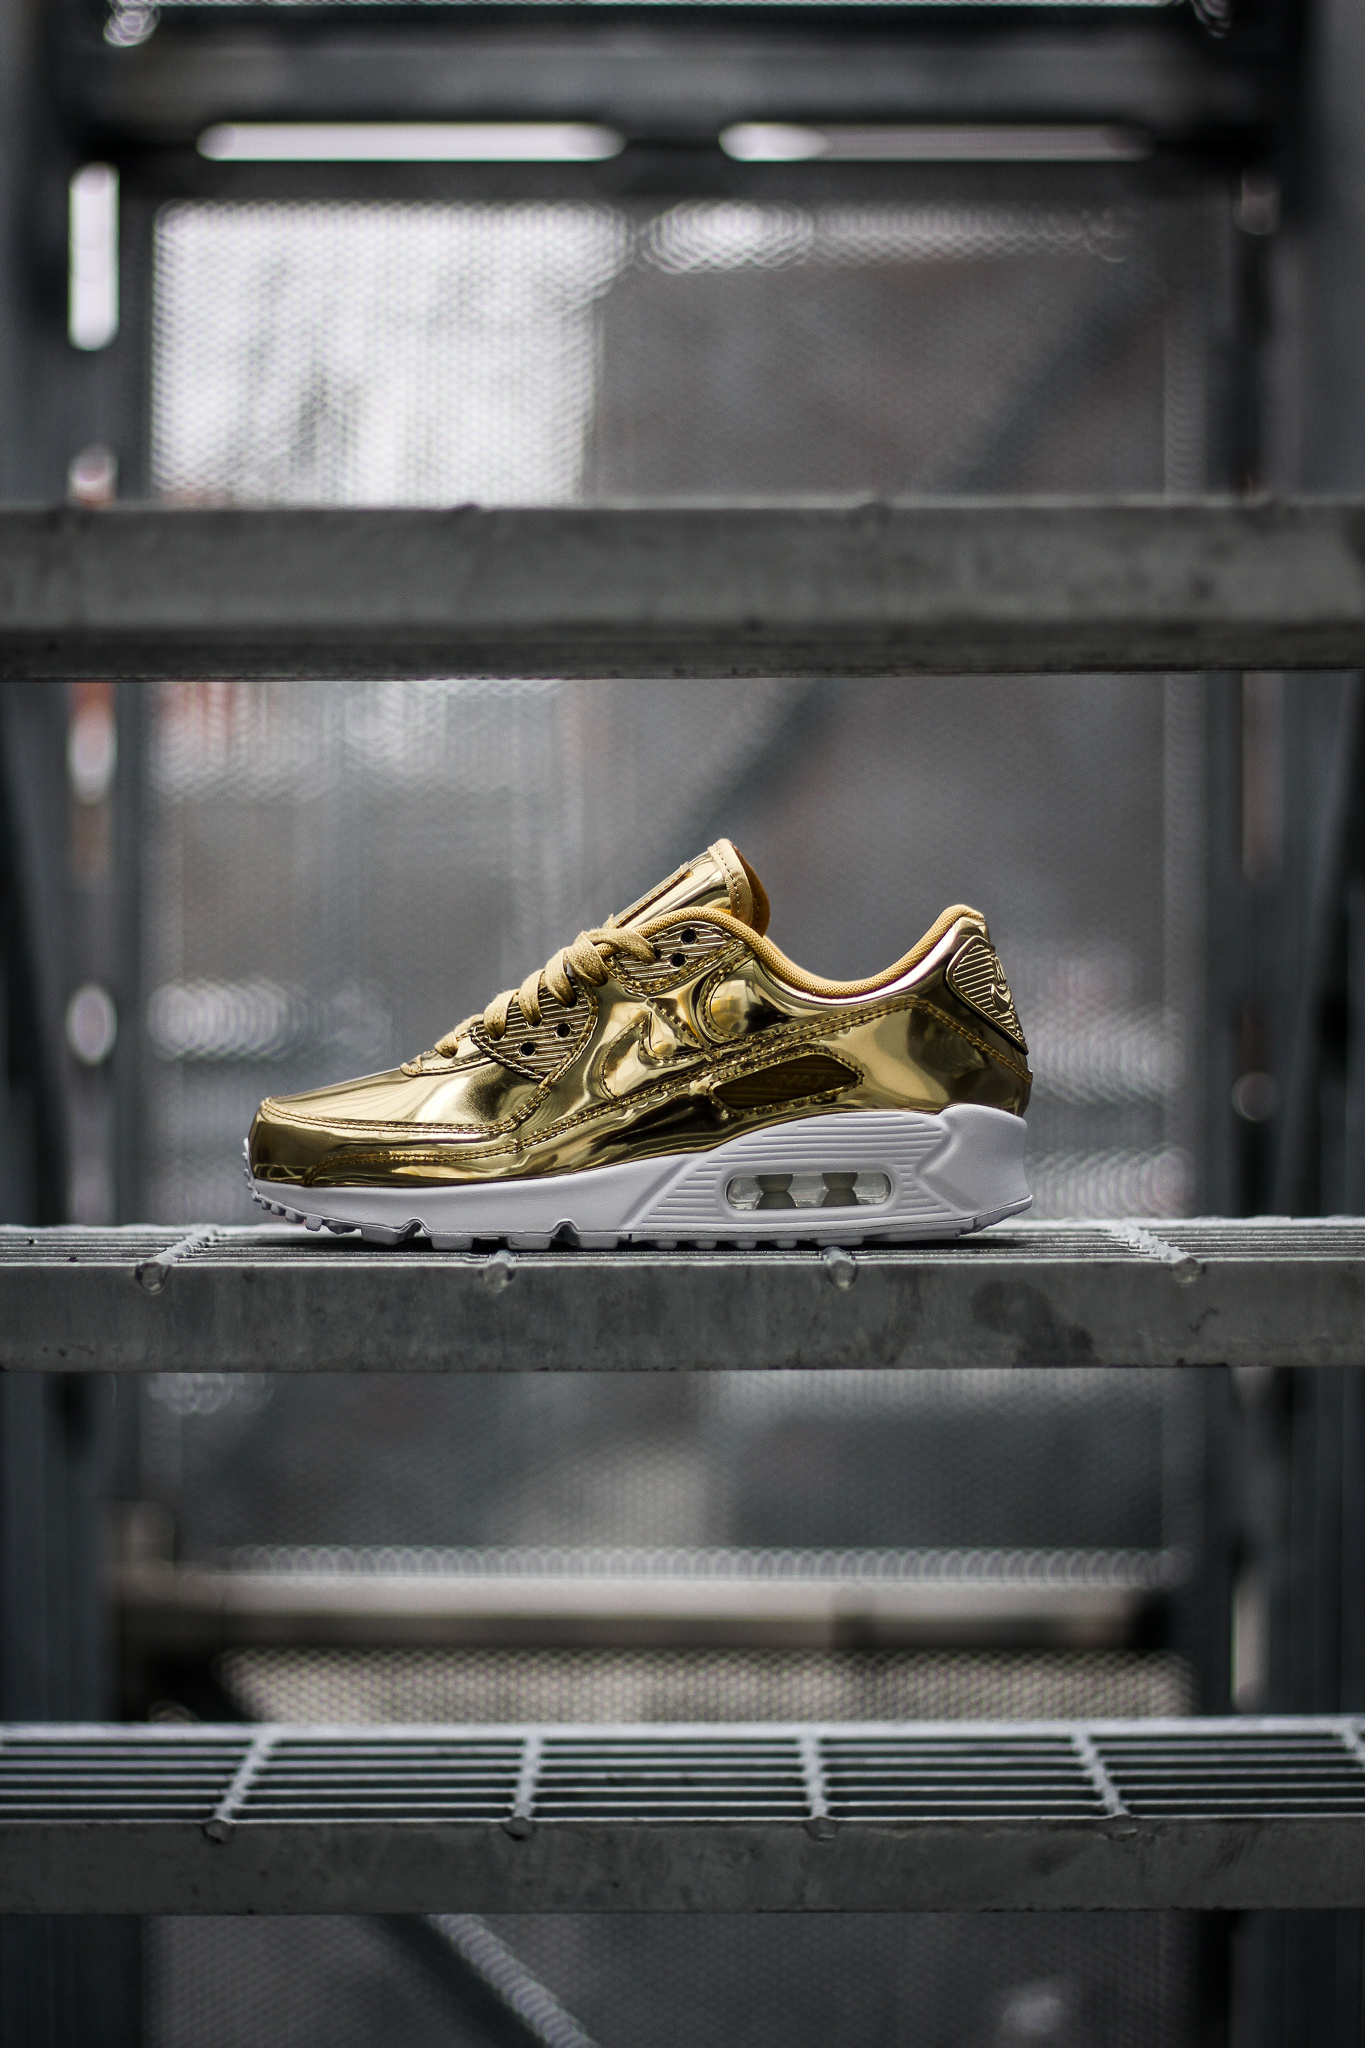 nike air max 90 womens shoes gold